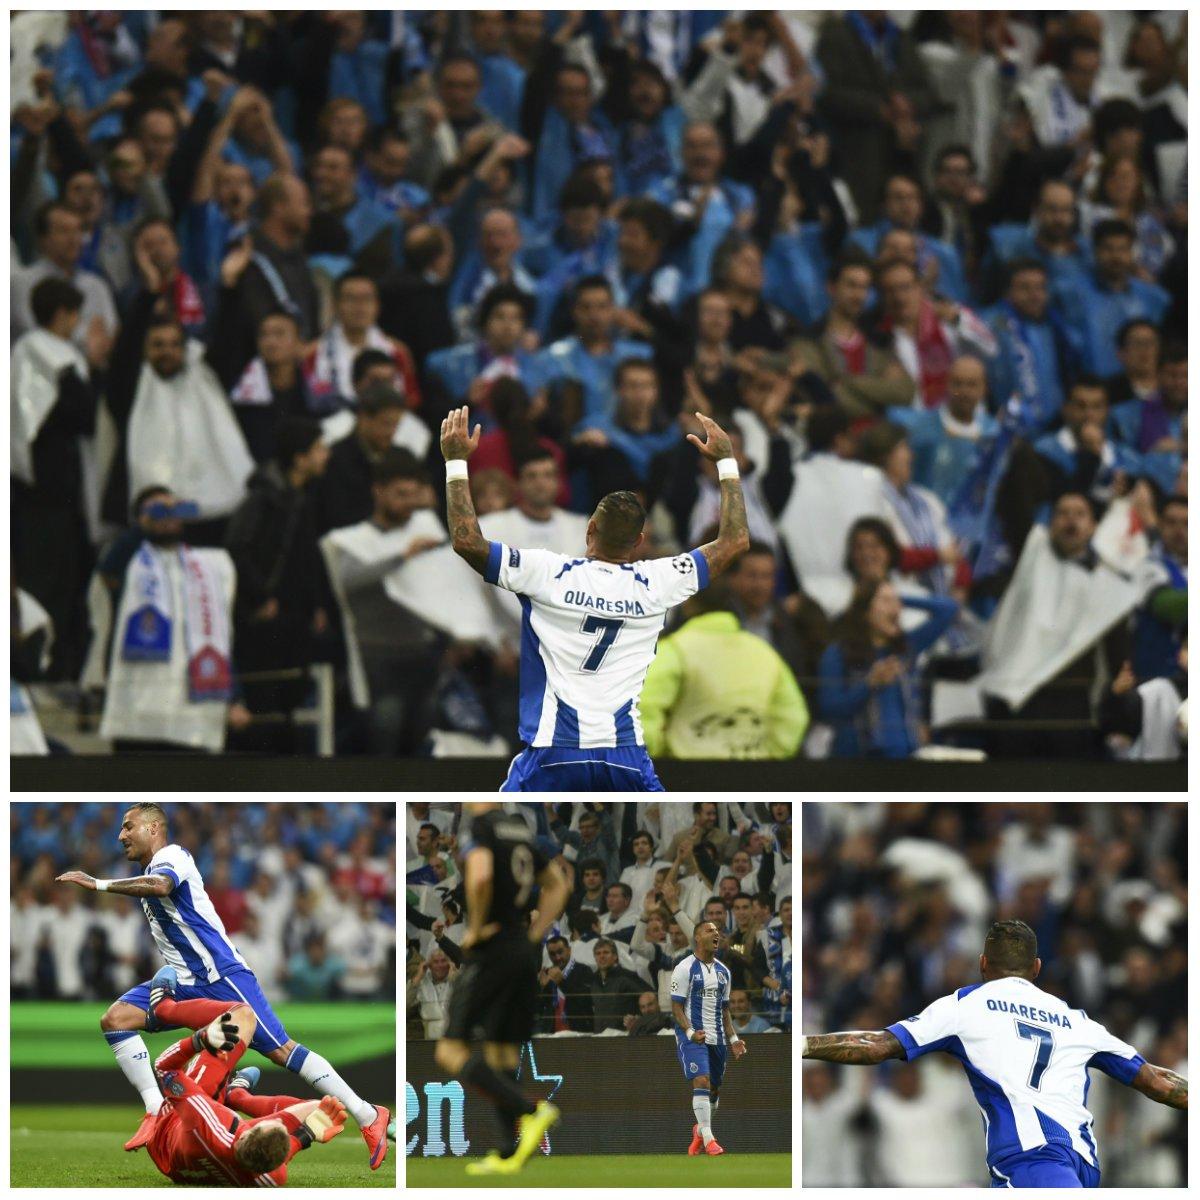 #MondayMotivaton @FCPorto 🆚 @FCBayern 3:...